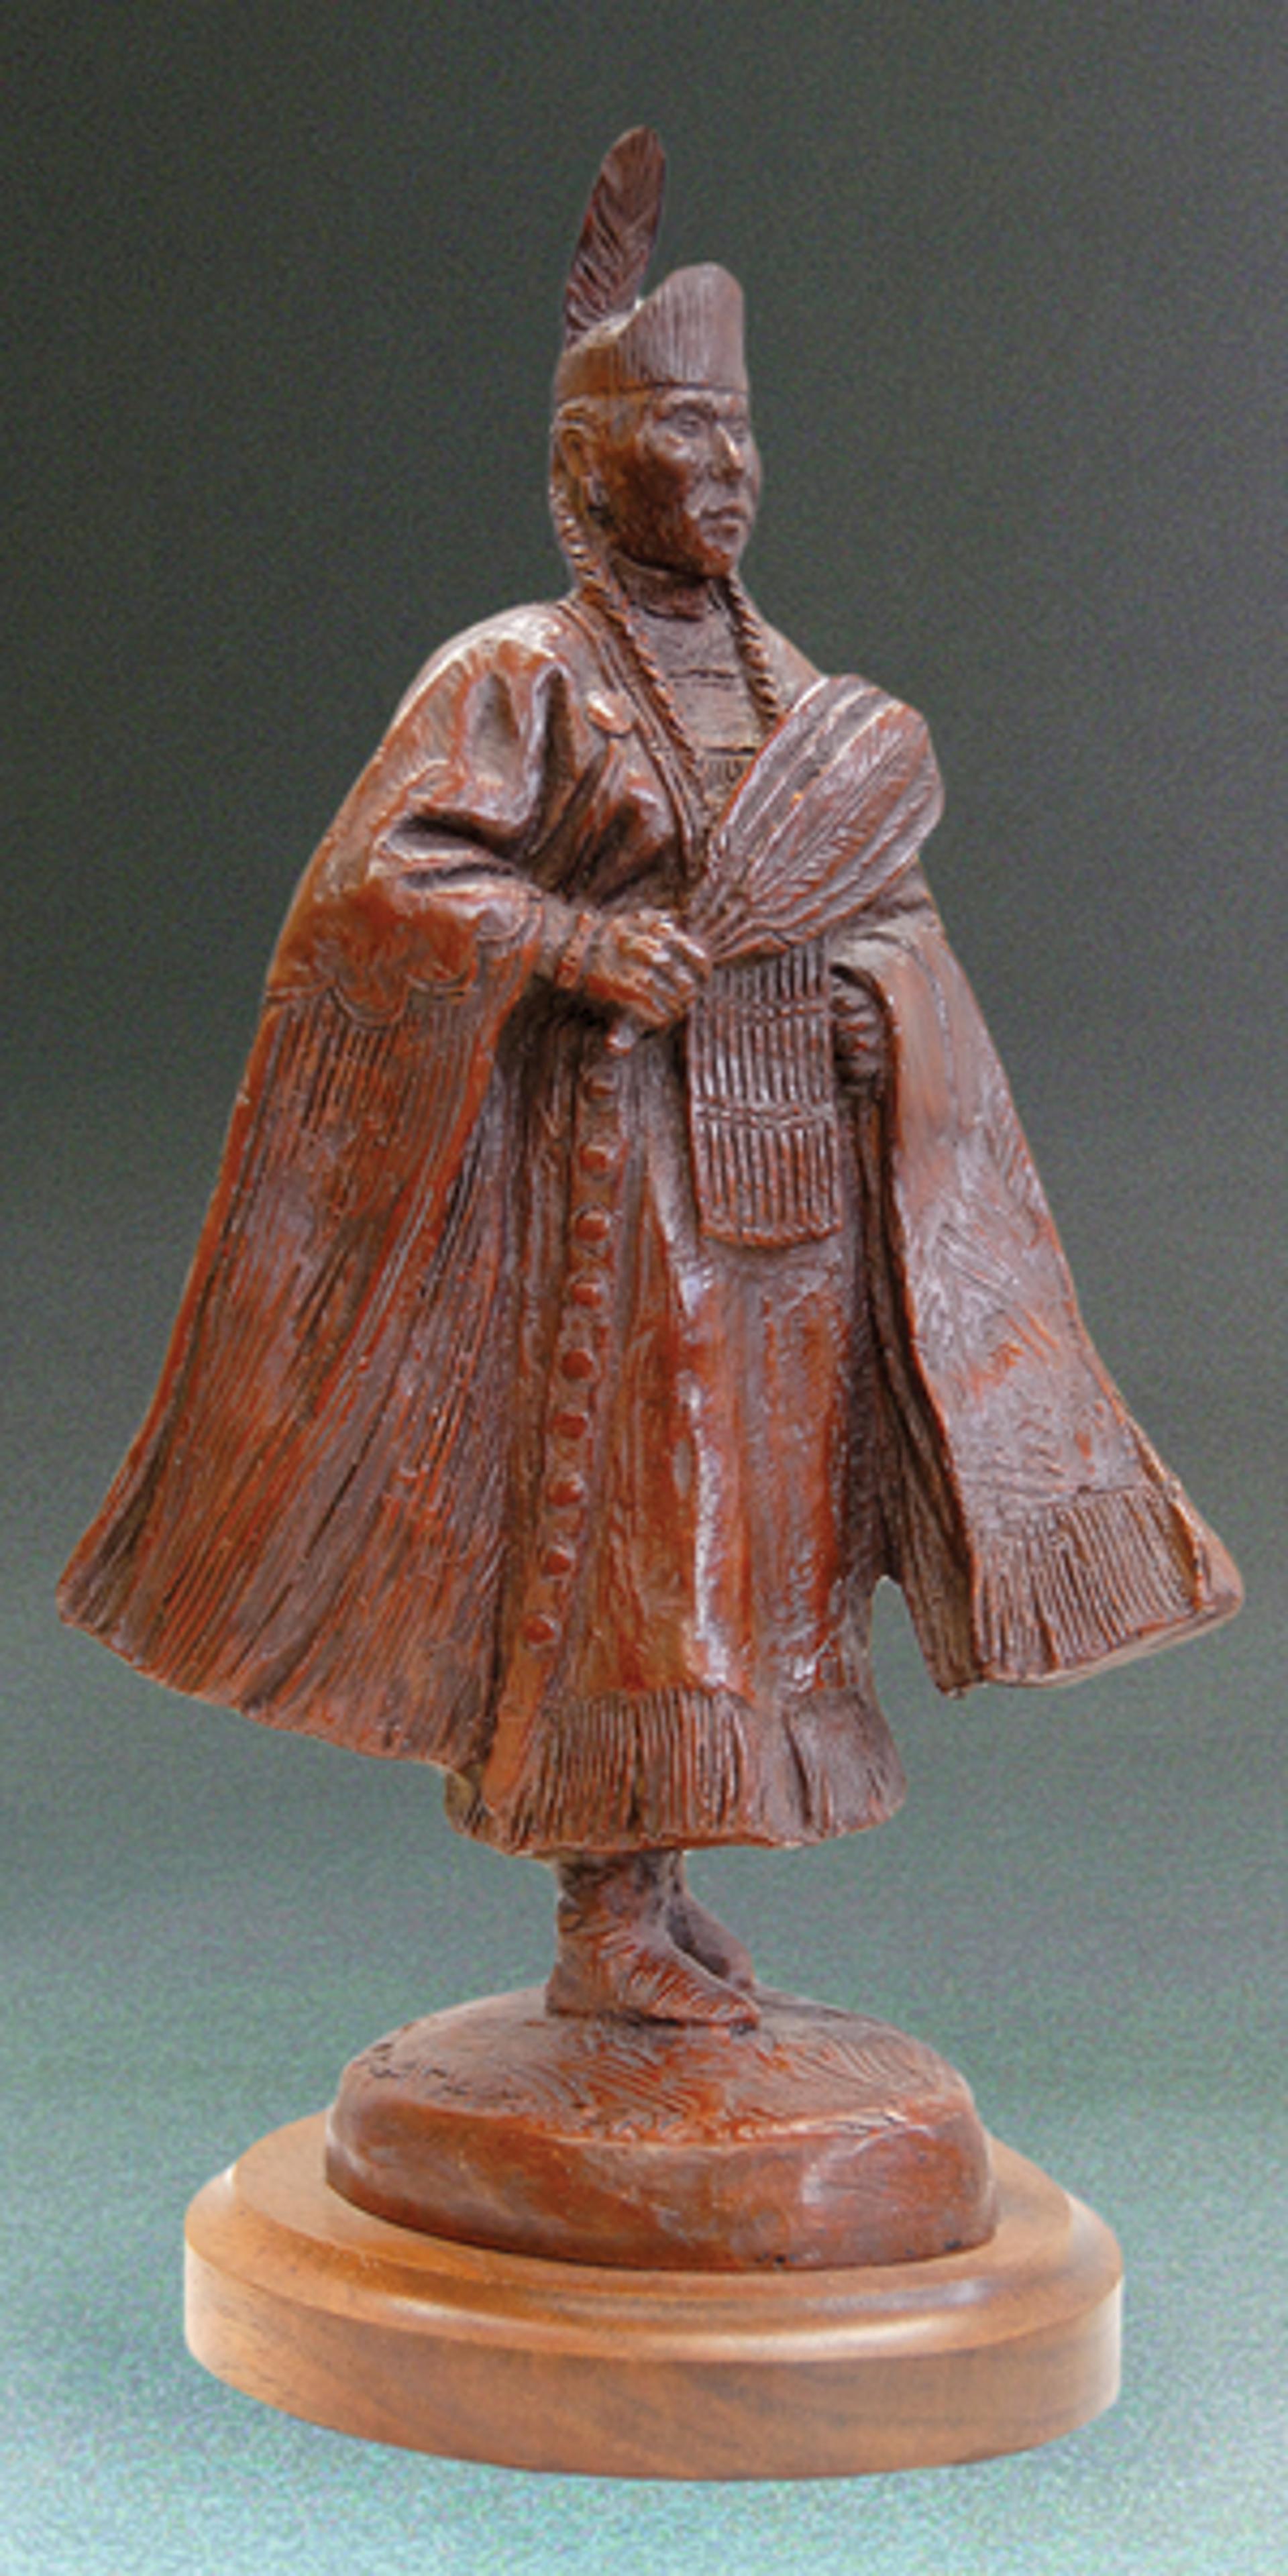 Buckskin Dancer by Harold Holden